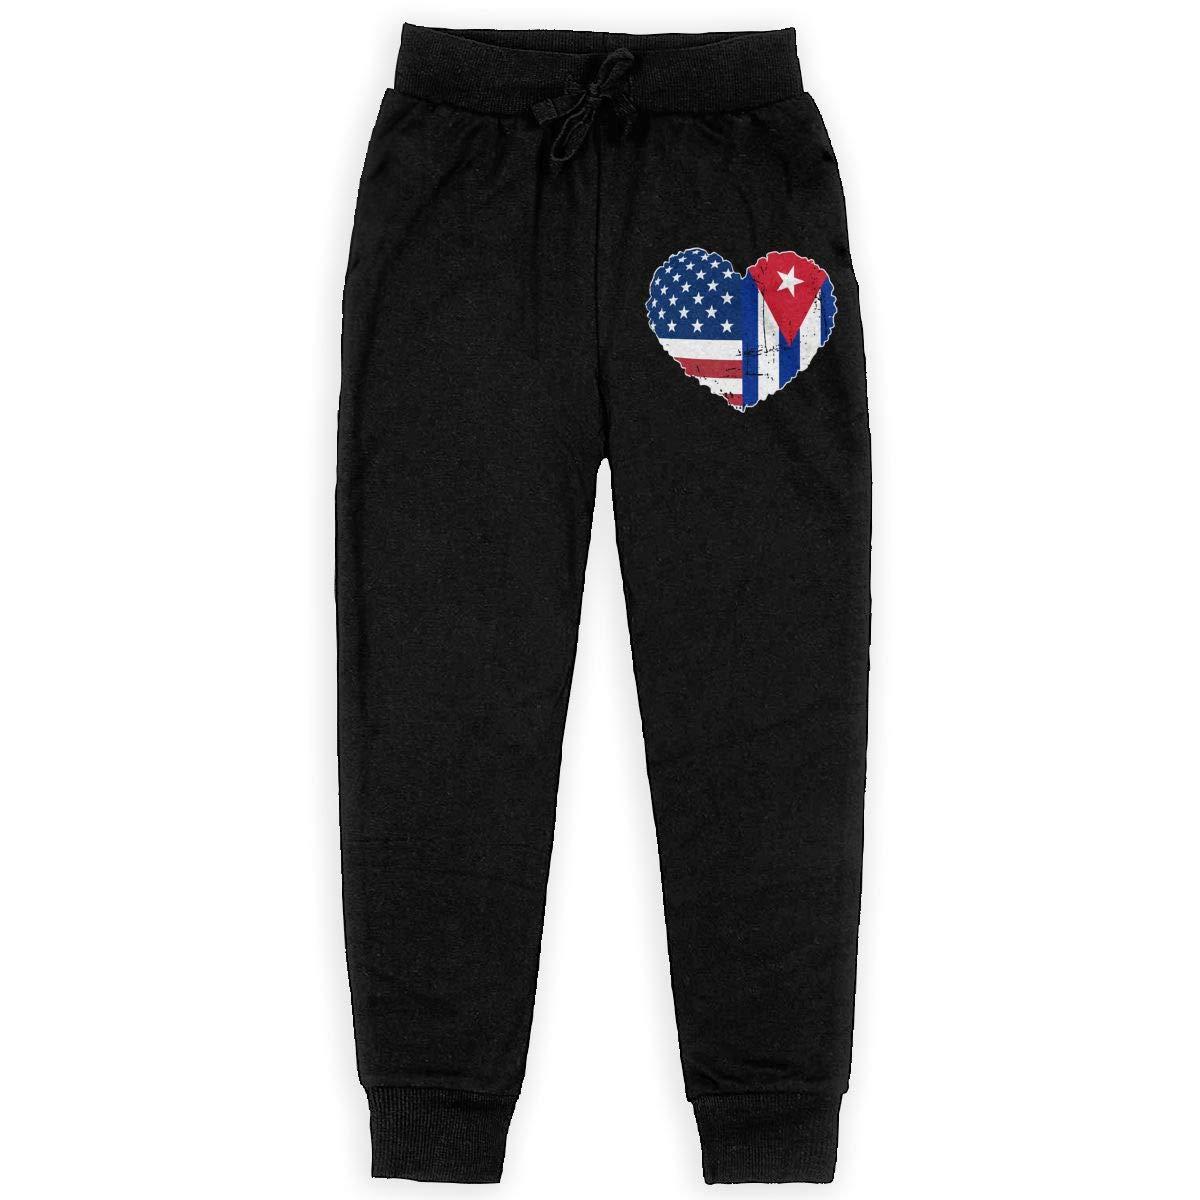 Boys Athletic Pants for Teen Girls WYZVK22 Cuba USA Flag Heart Soft//Cozy Sweatpants